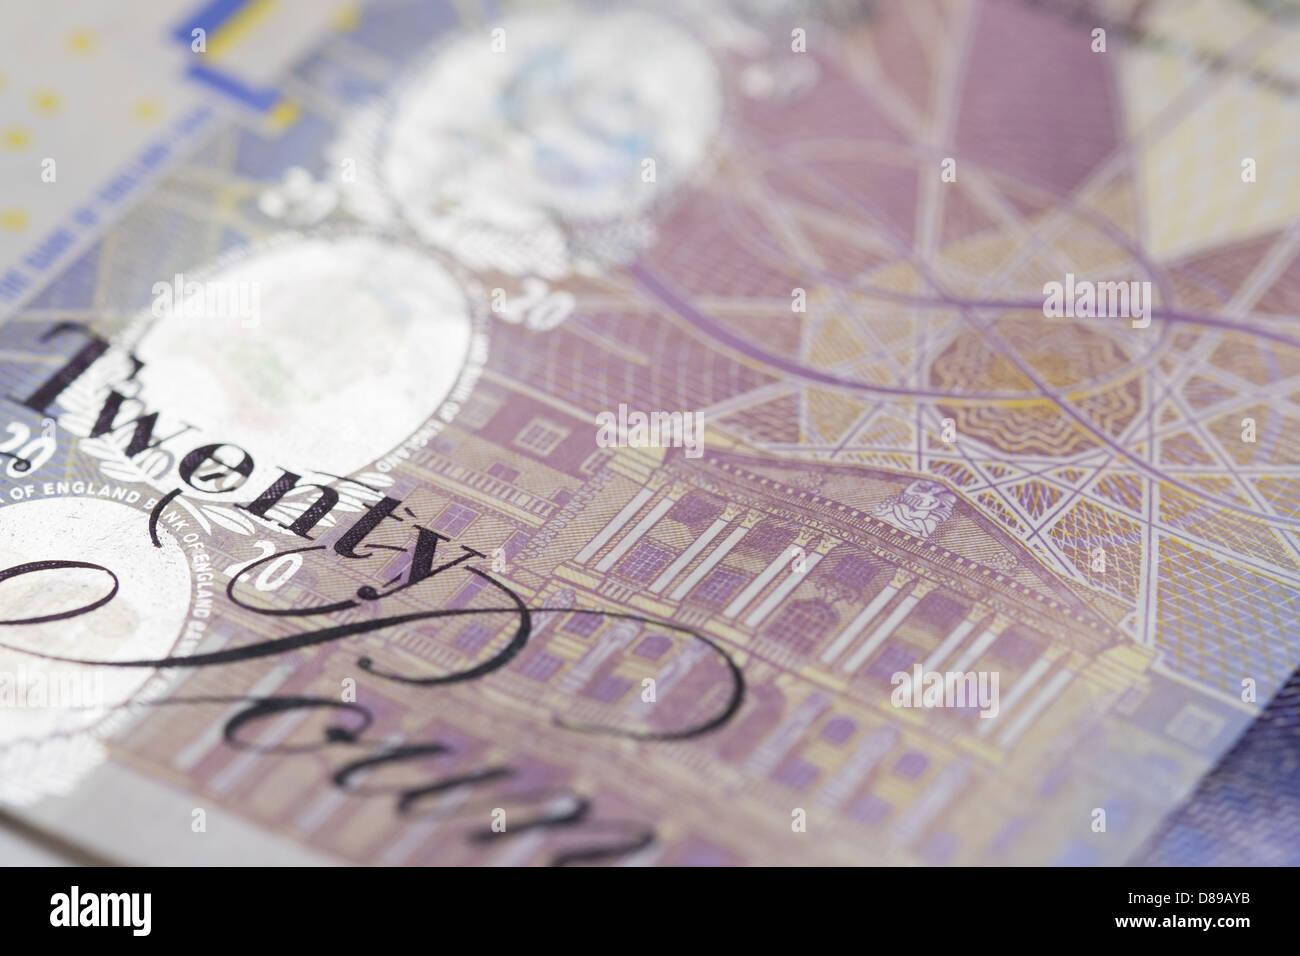 A close up of a twenty pound note. - Stock Image